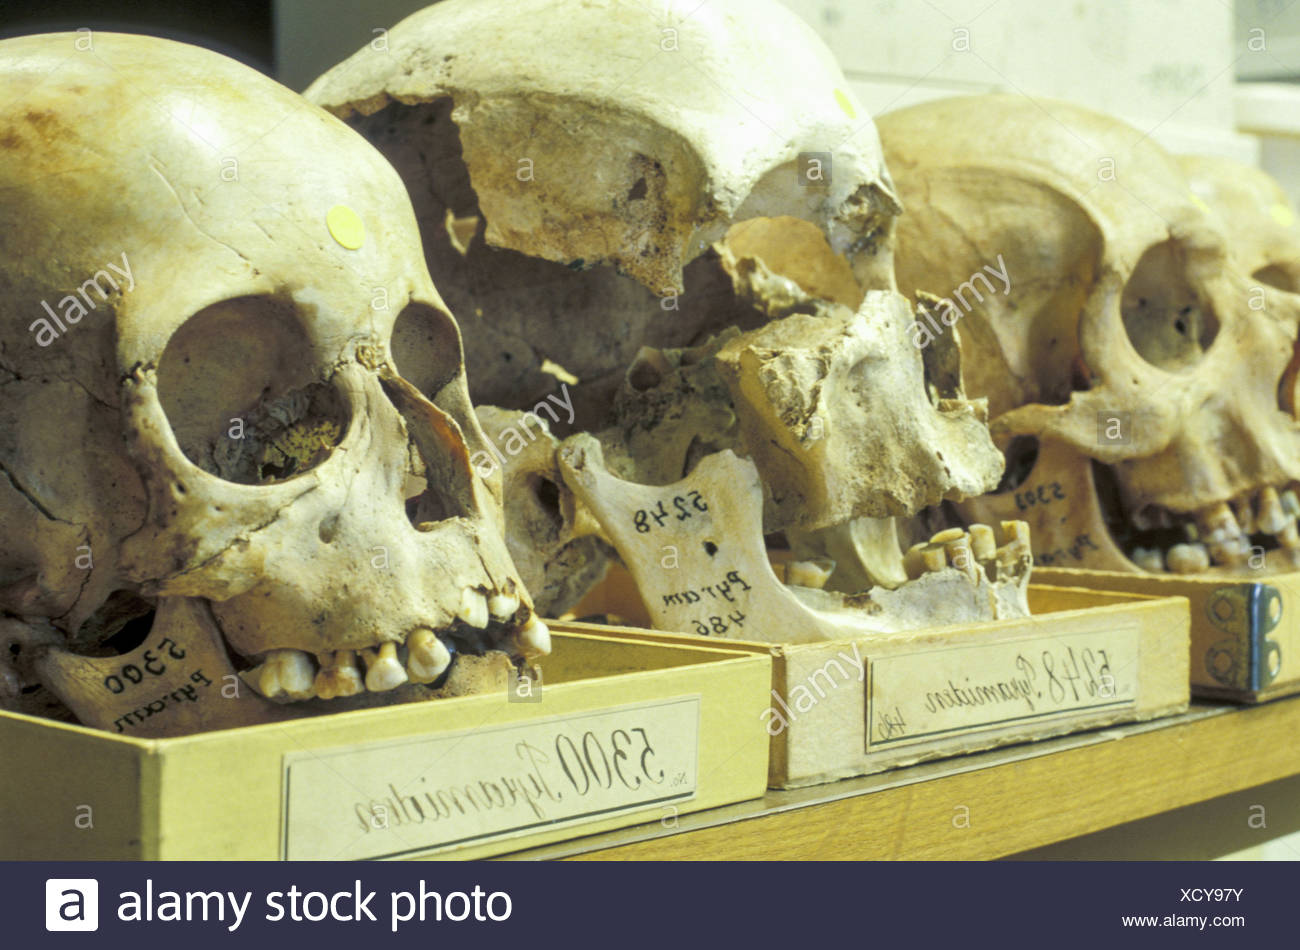 anthropology - Stock Image